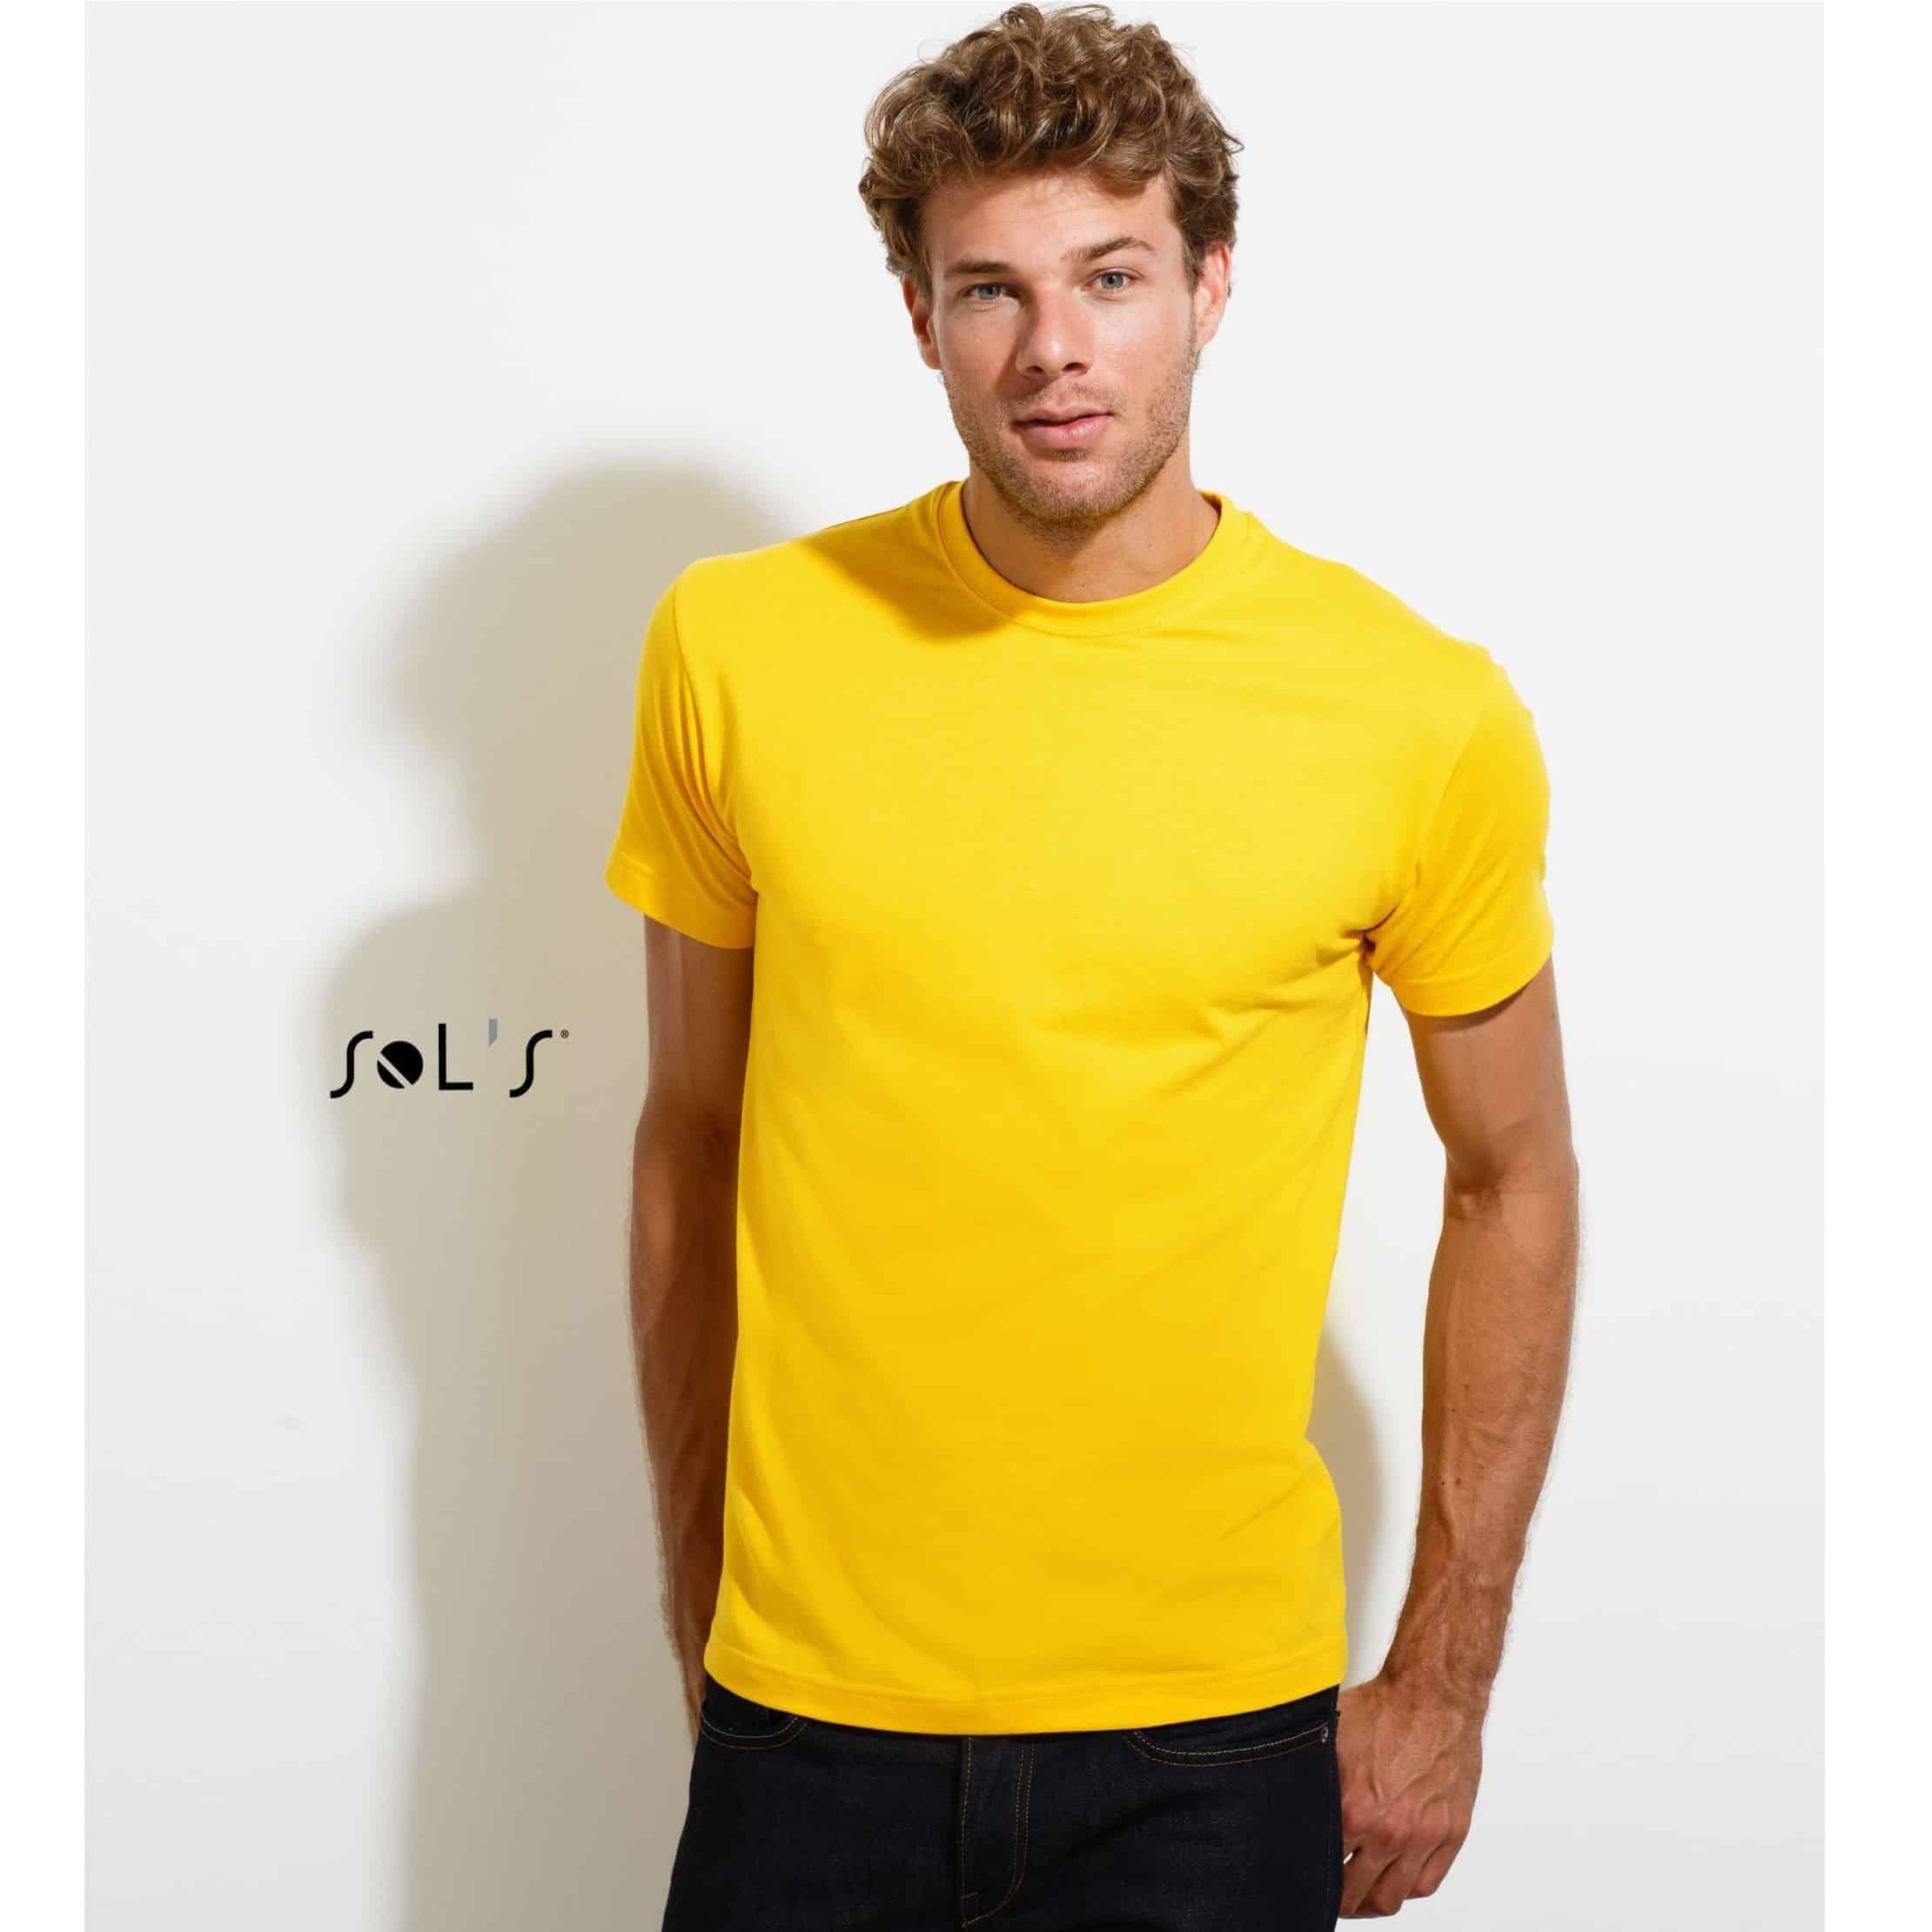 2f3f7be90c93 T-shirt Imperial Sol s Ανδρικό Με Στρογγυλή Λαιμόκοψη